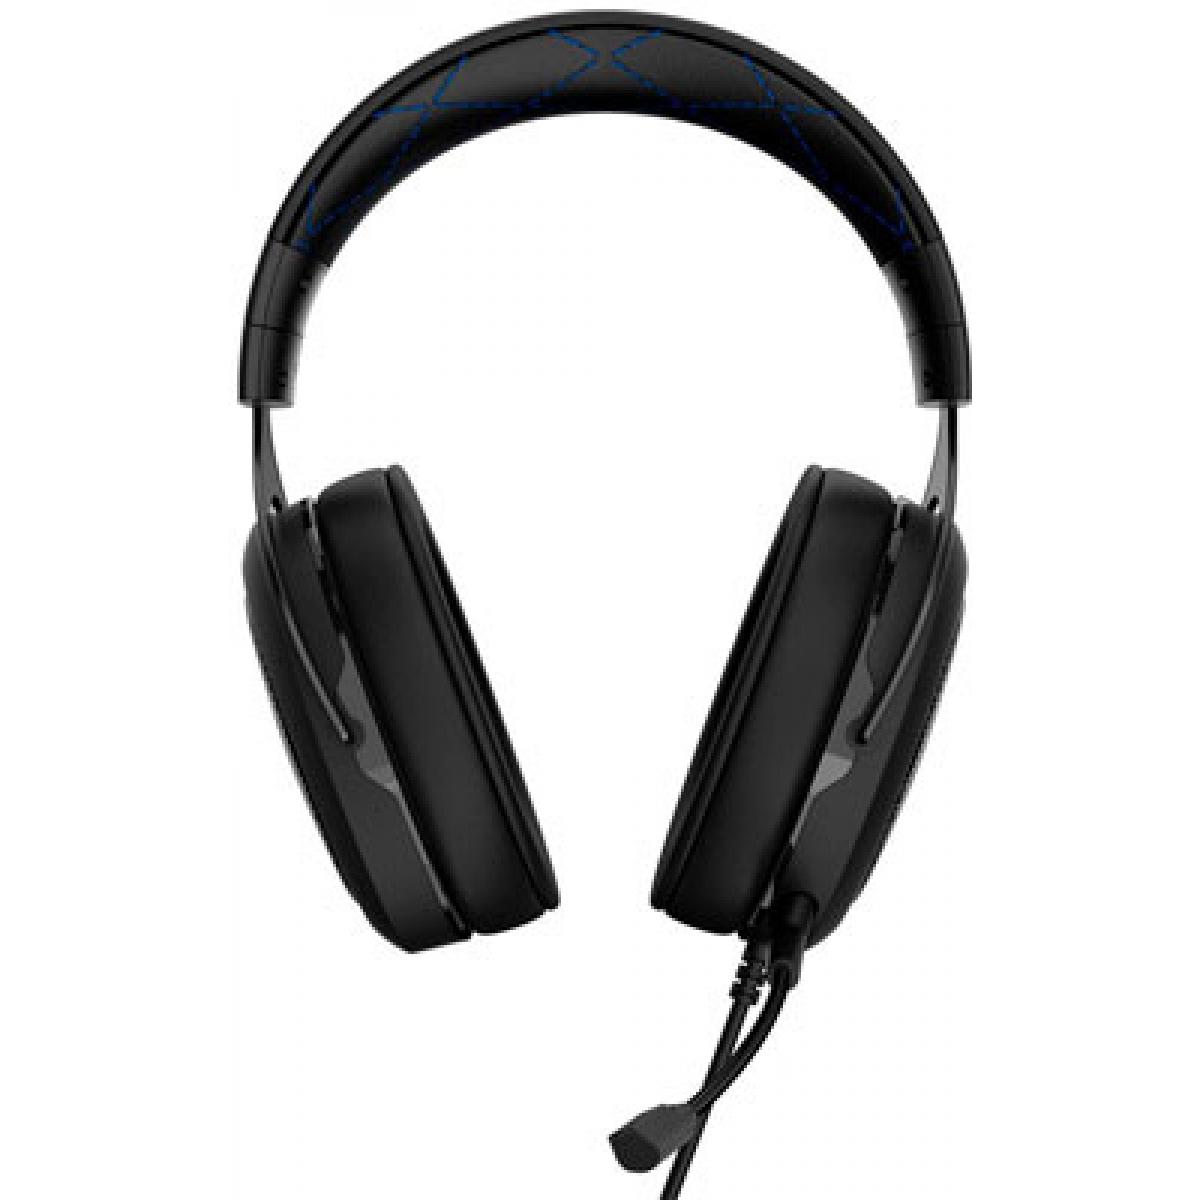 Headset Gamer Corsair HS50 Blue CA-9011172-NA